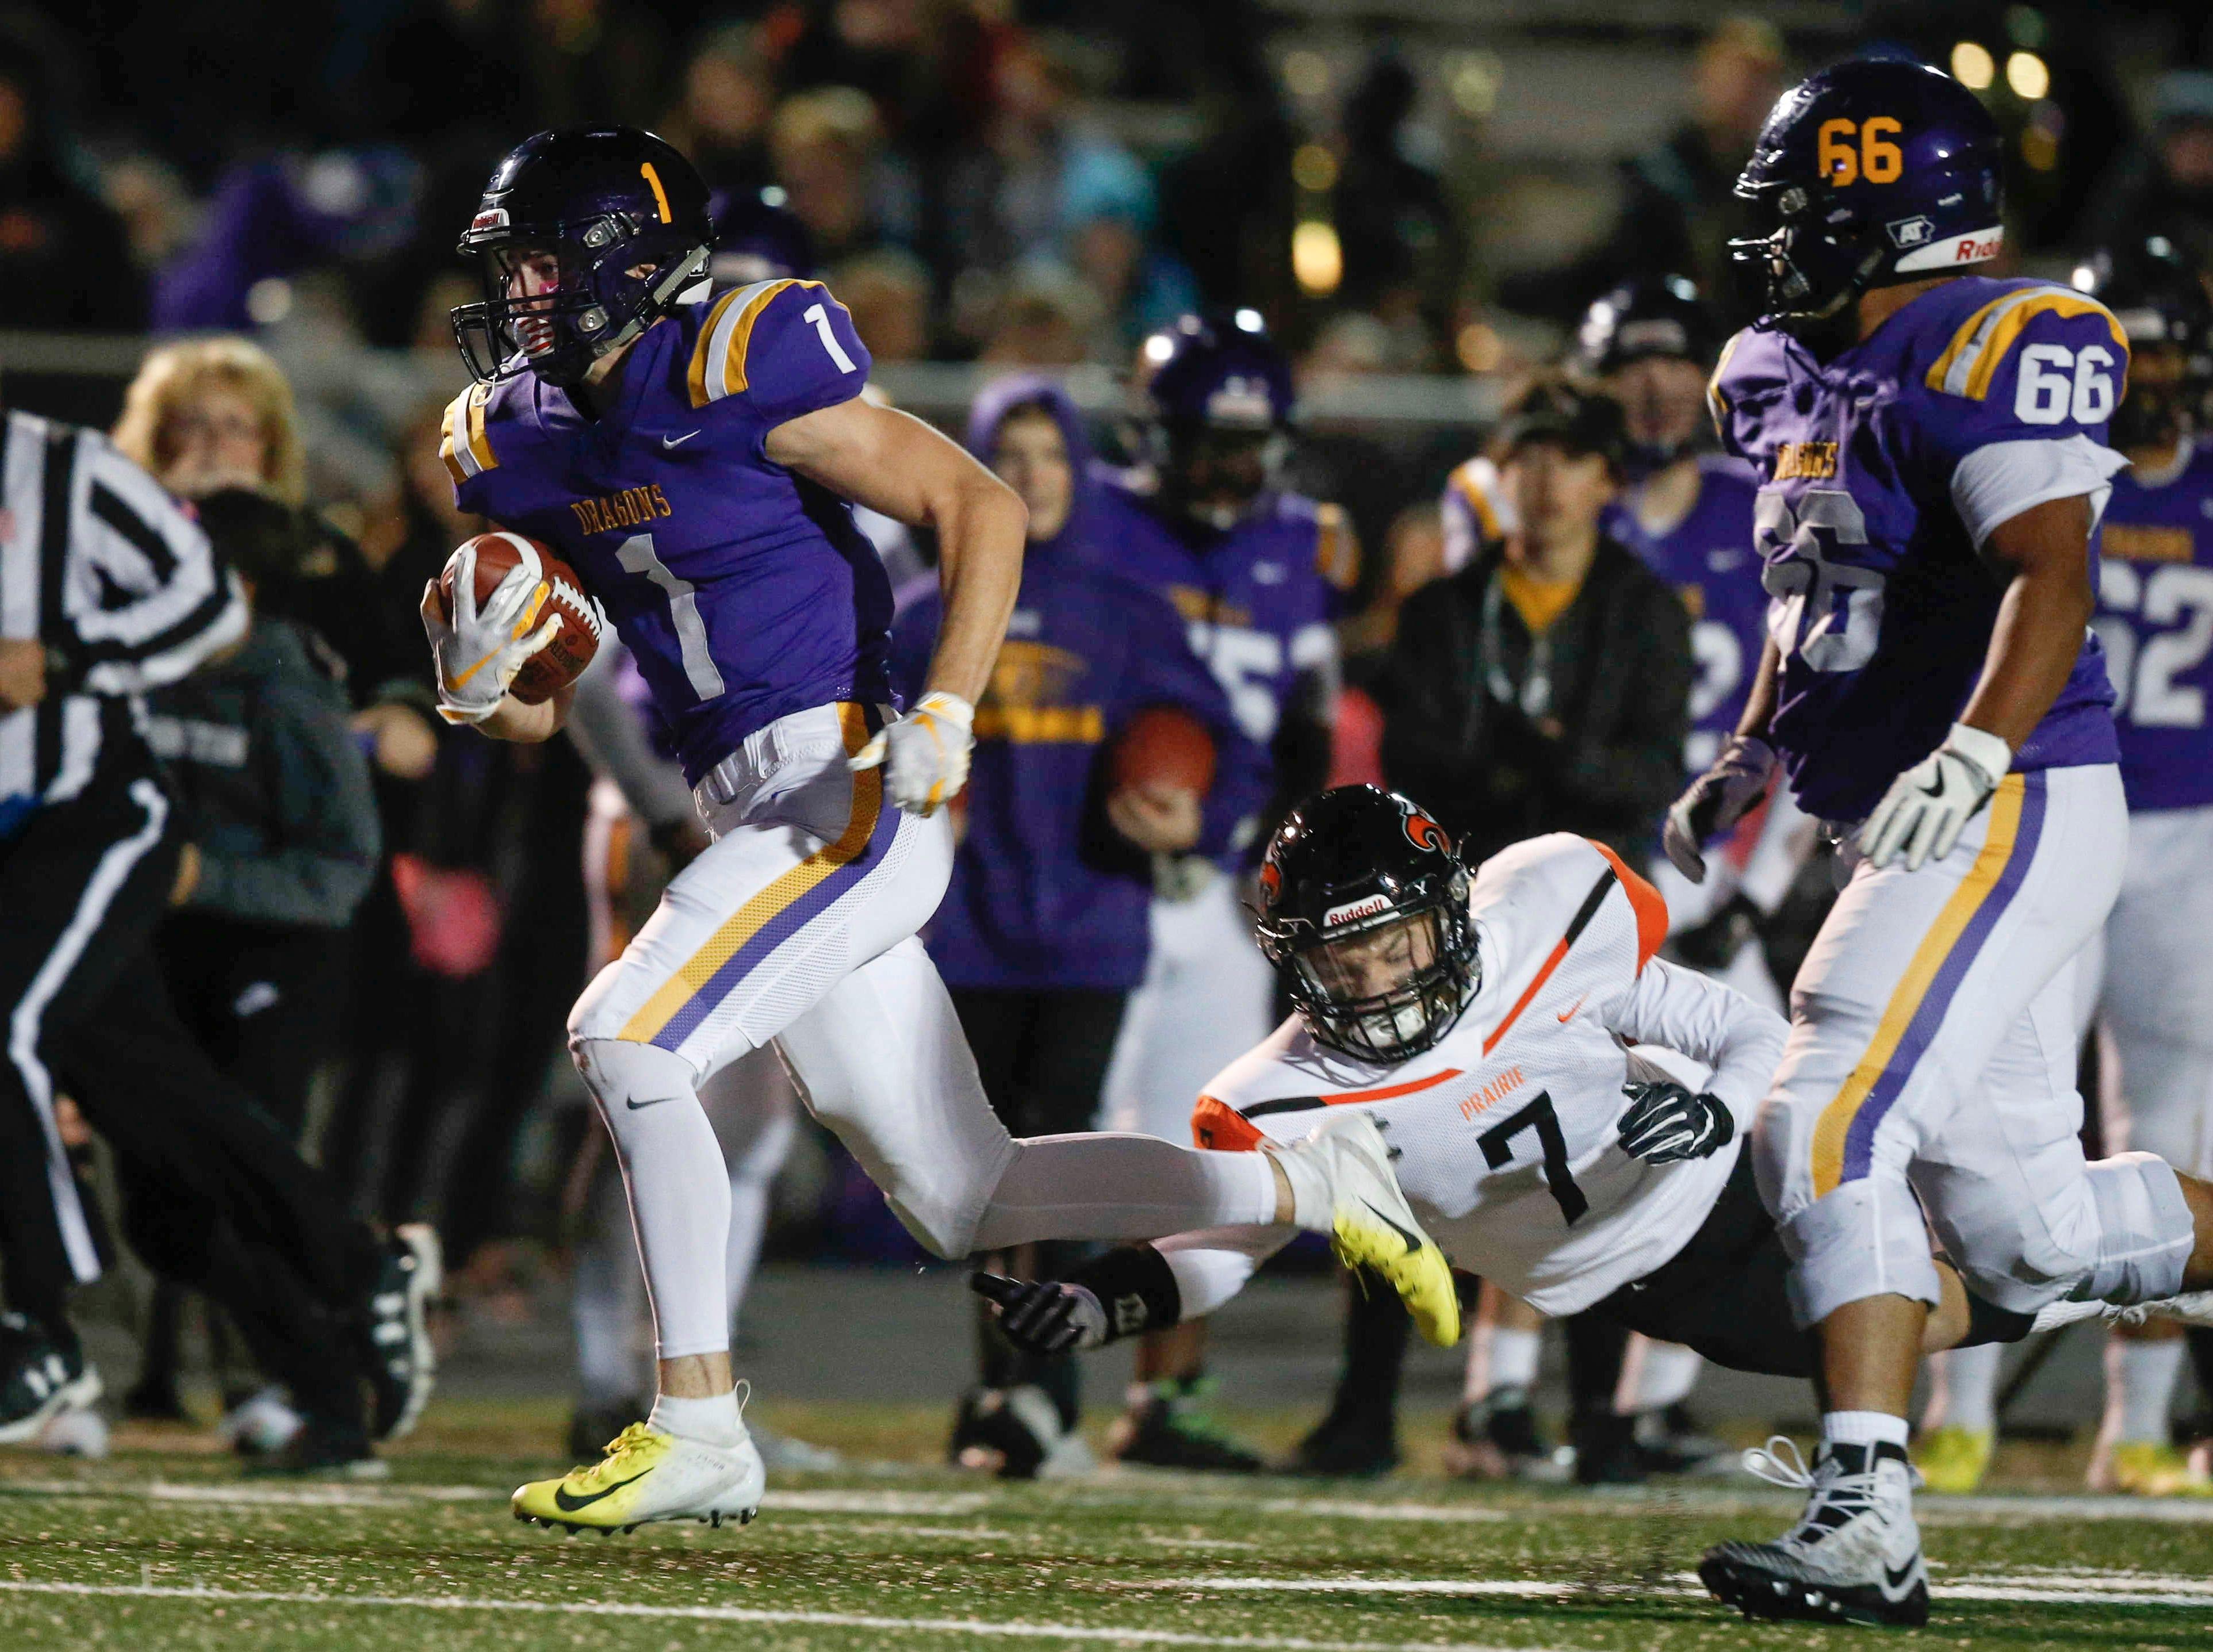 Johnston receiver Blake Murray runs the ball for a touchdown against Cedar Rapids Prairie during the first round of Iowa high school football playoffs on Friday, Oct. 26, 2018.